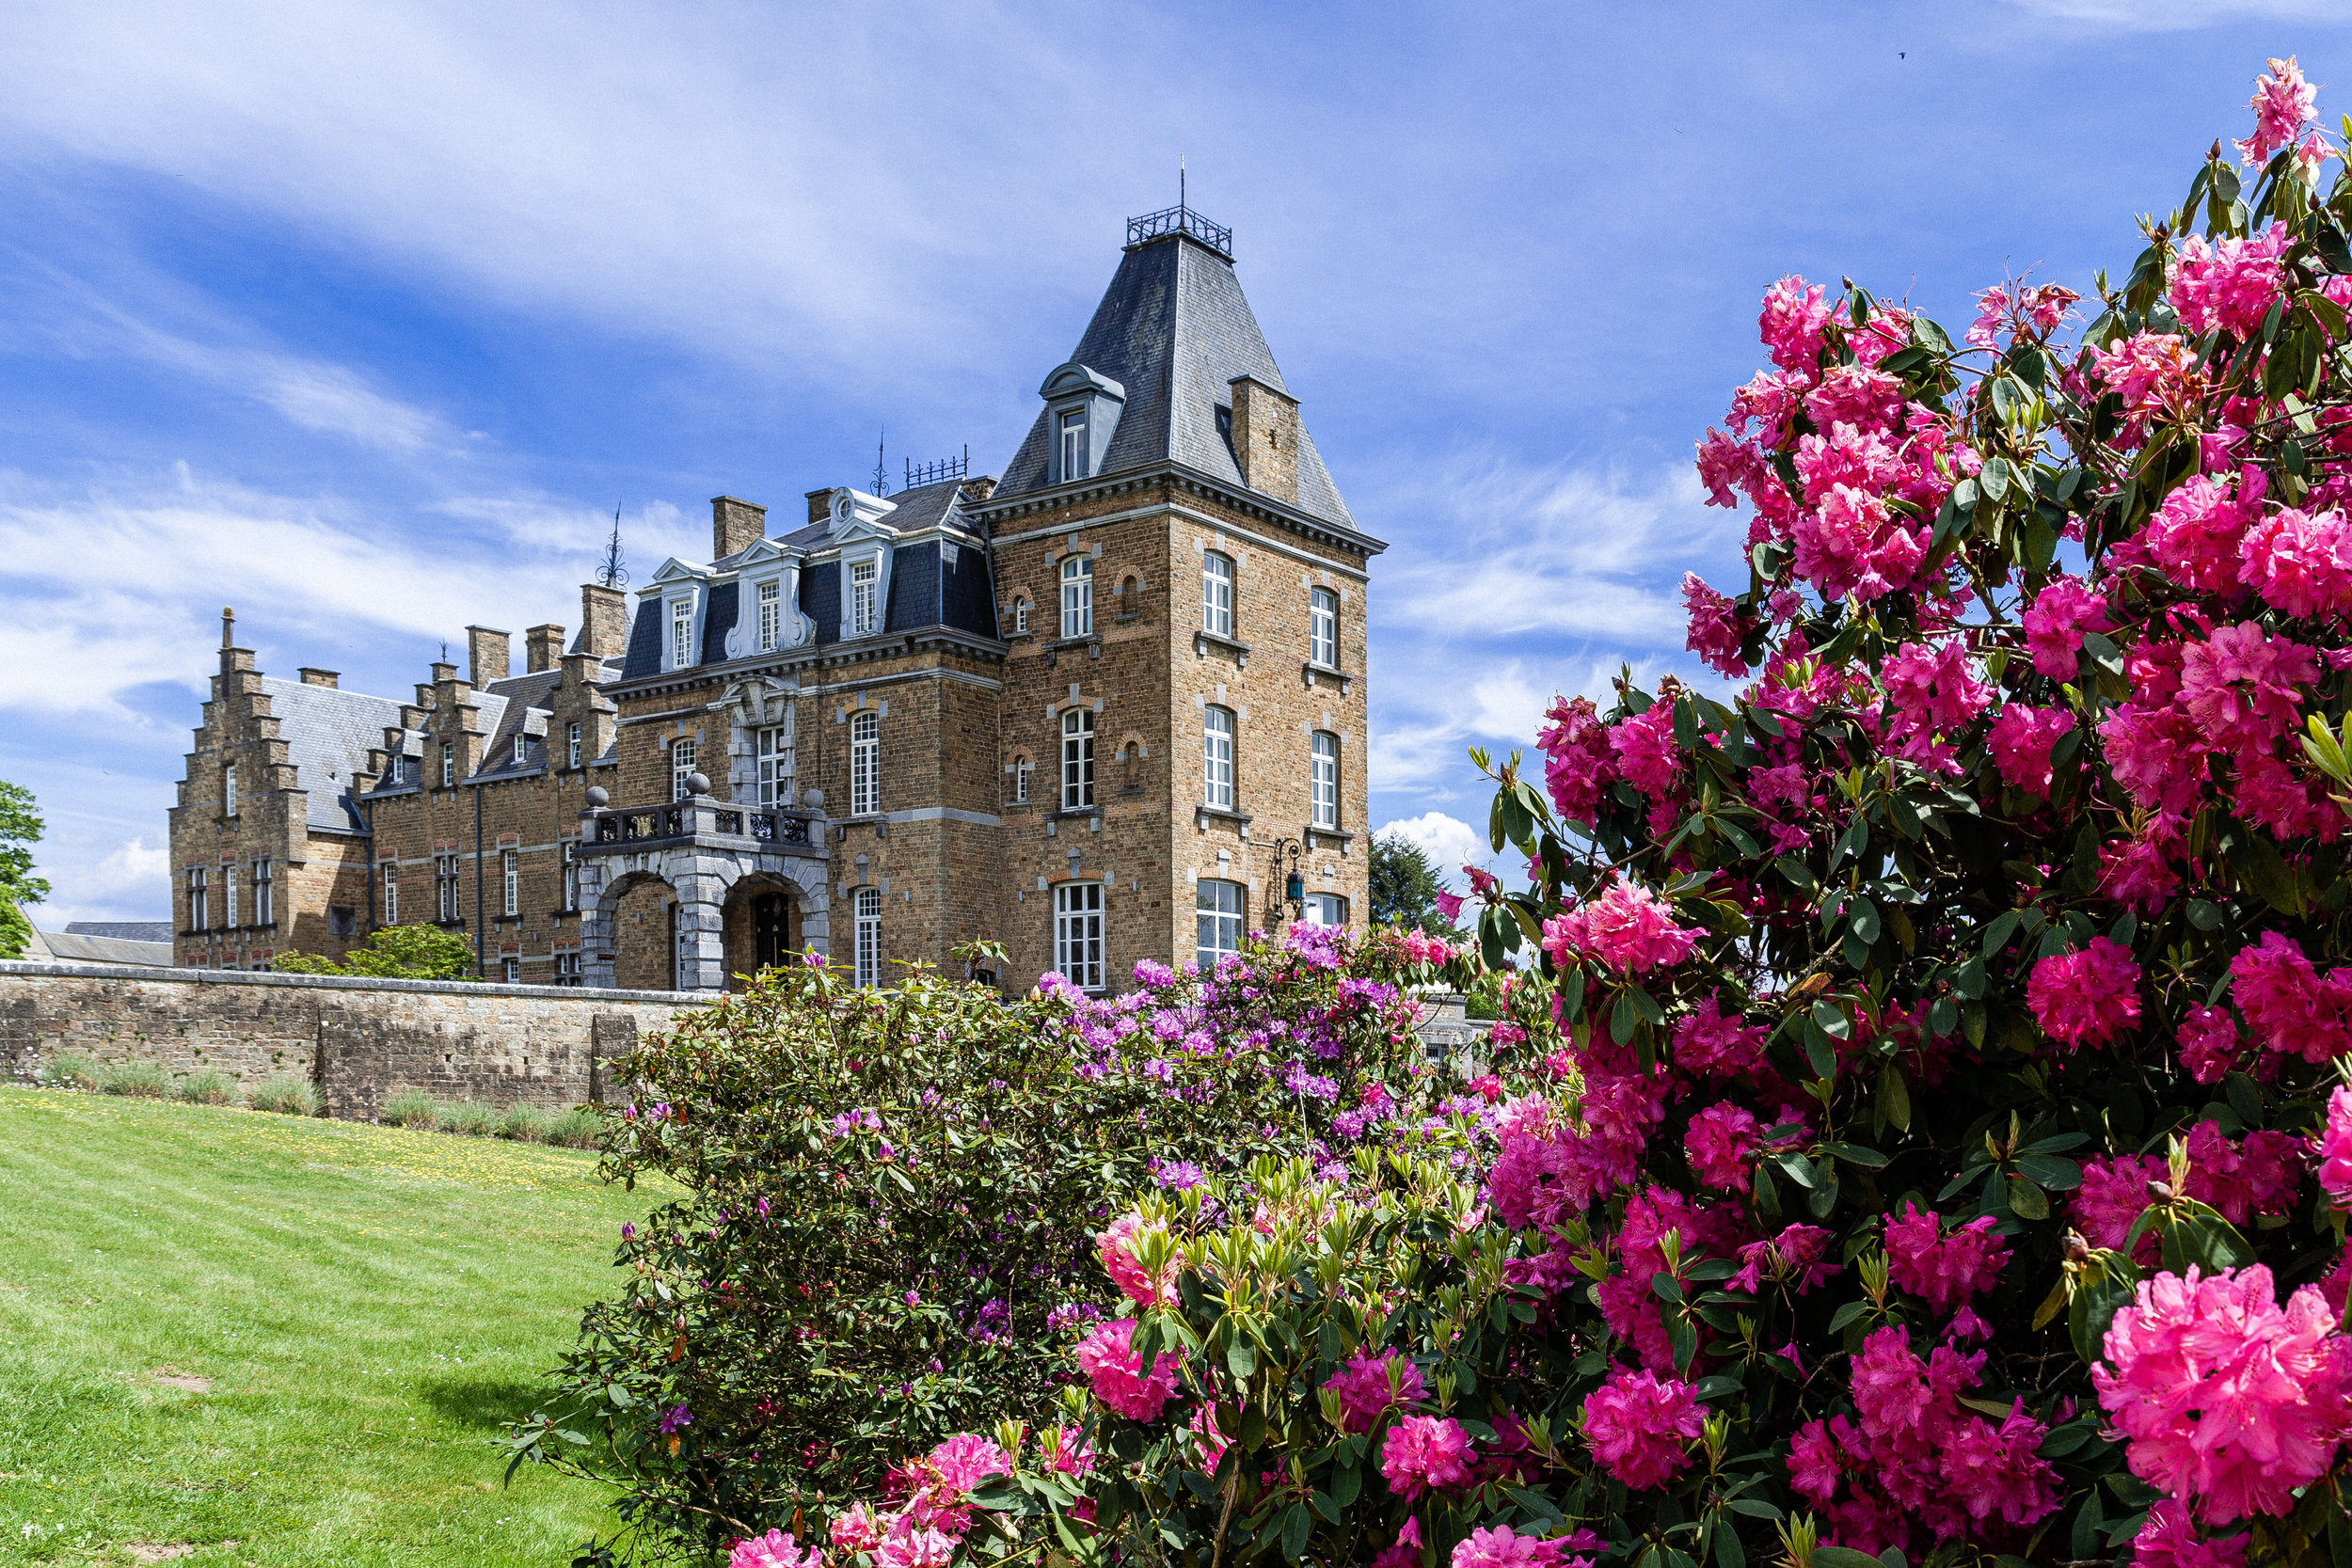 domaine-de-ronchinne-chateau-rhodos-01.jpg